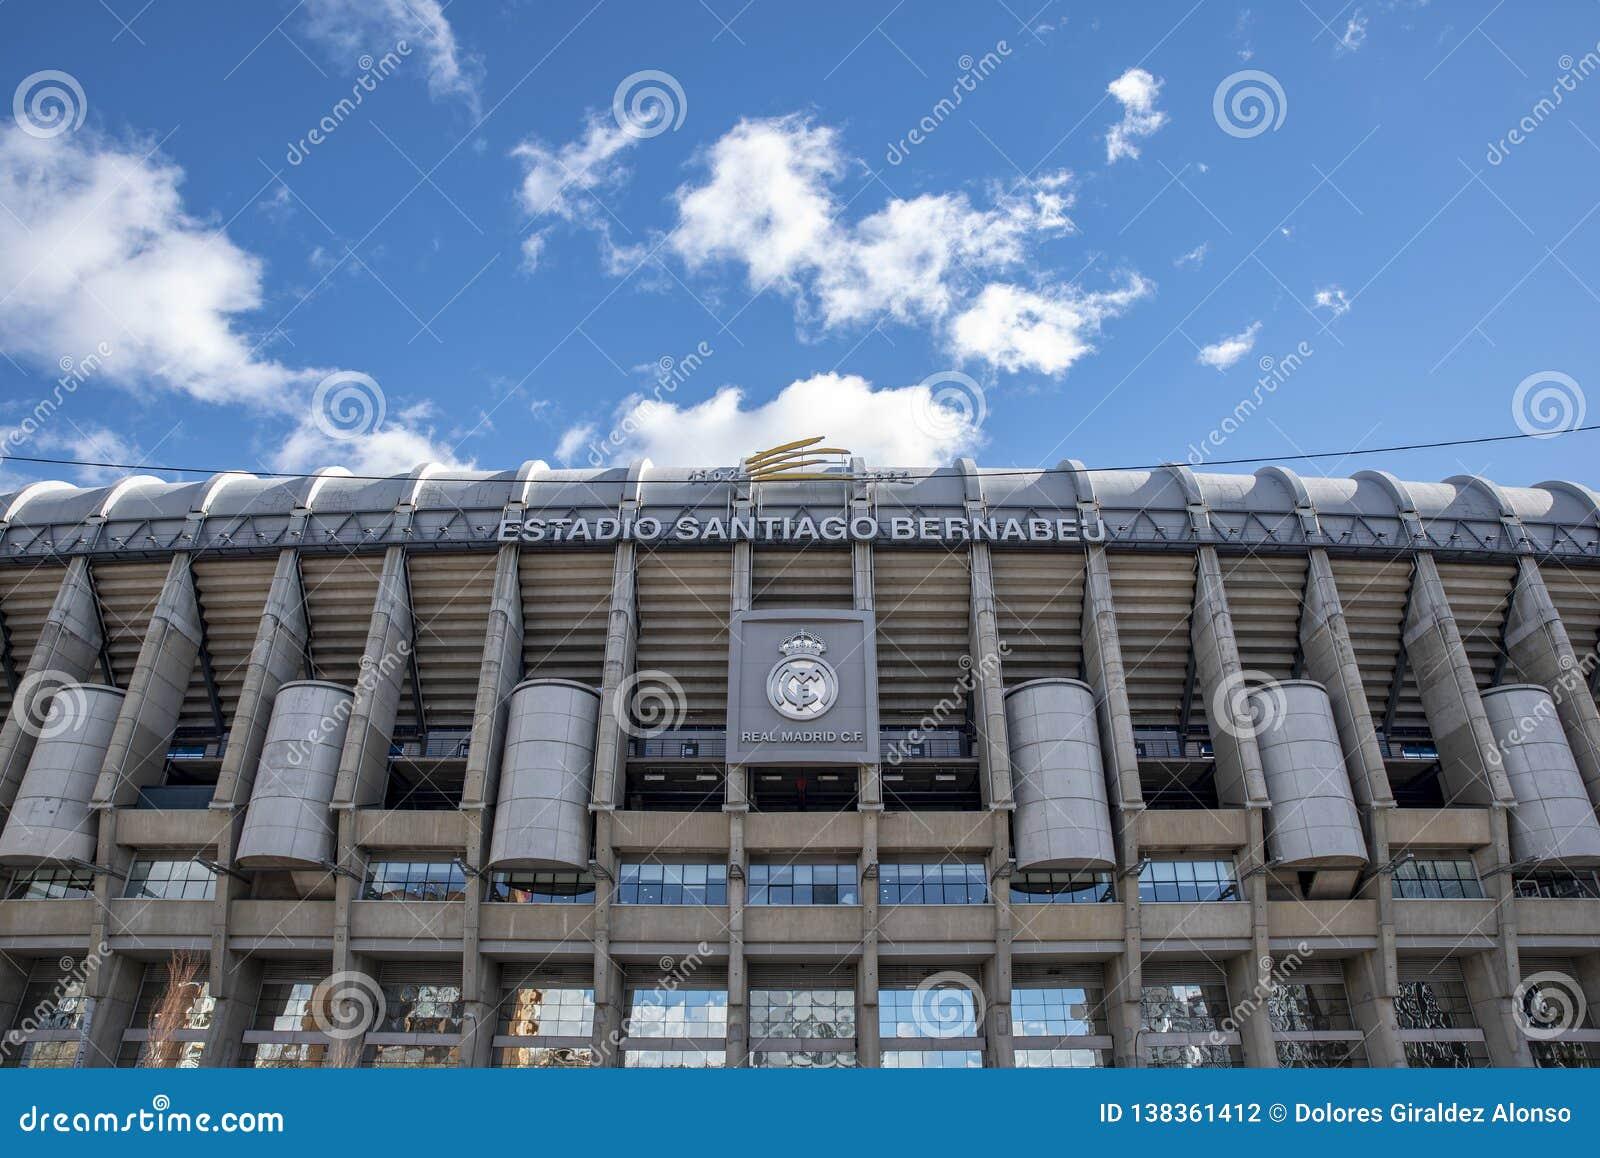 Santiago Bernabeu stadium - the official arena of FC Real Madrid